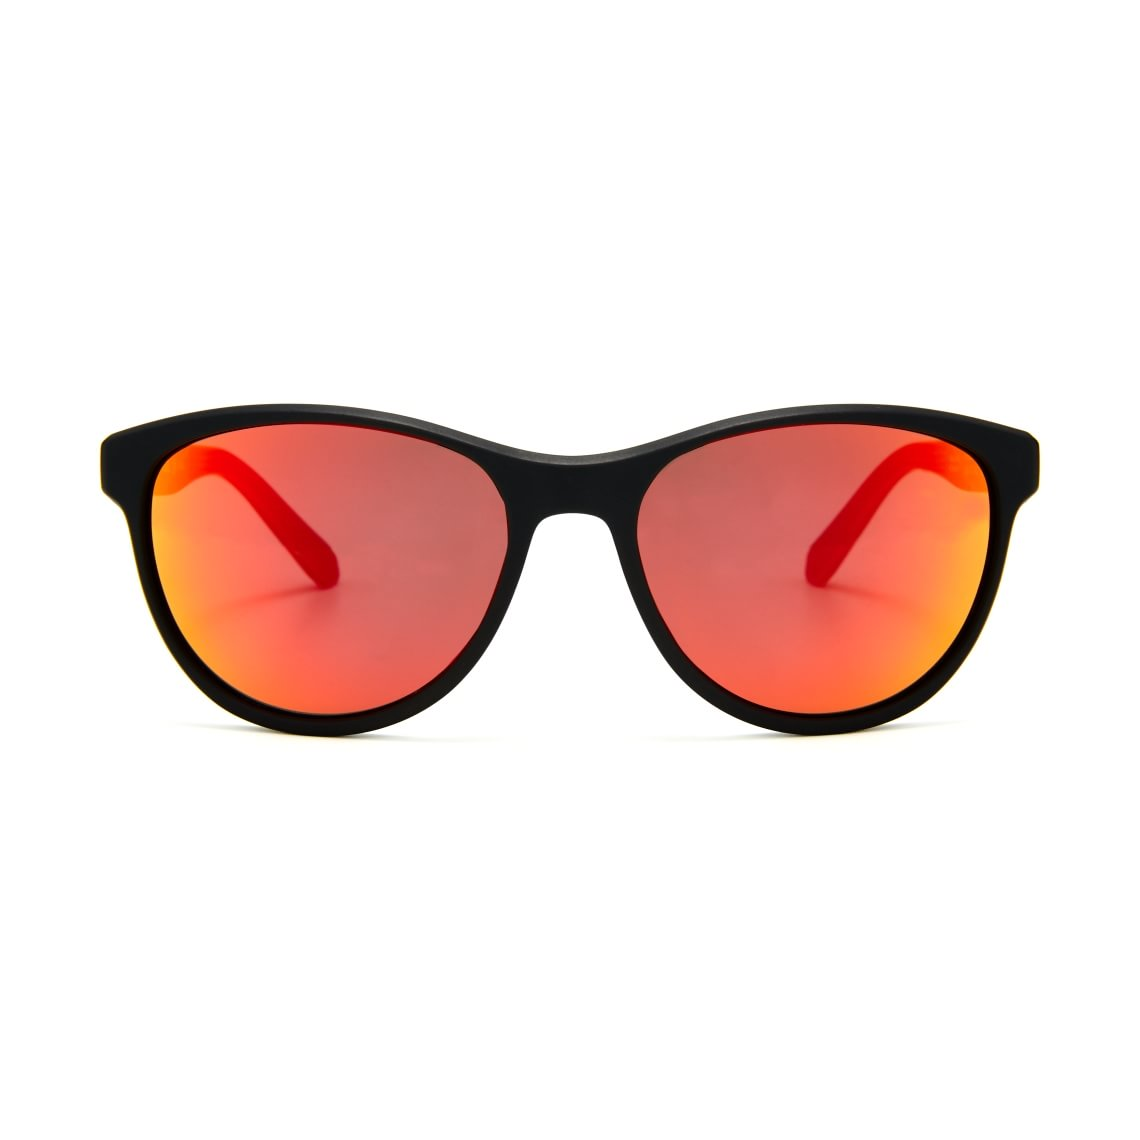 RIGEL Red Orange Mirror Nova C40 5617